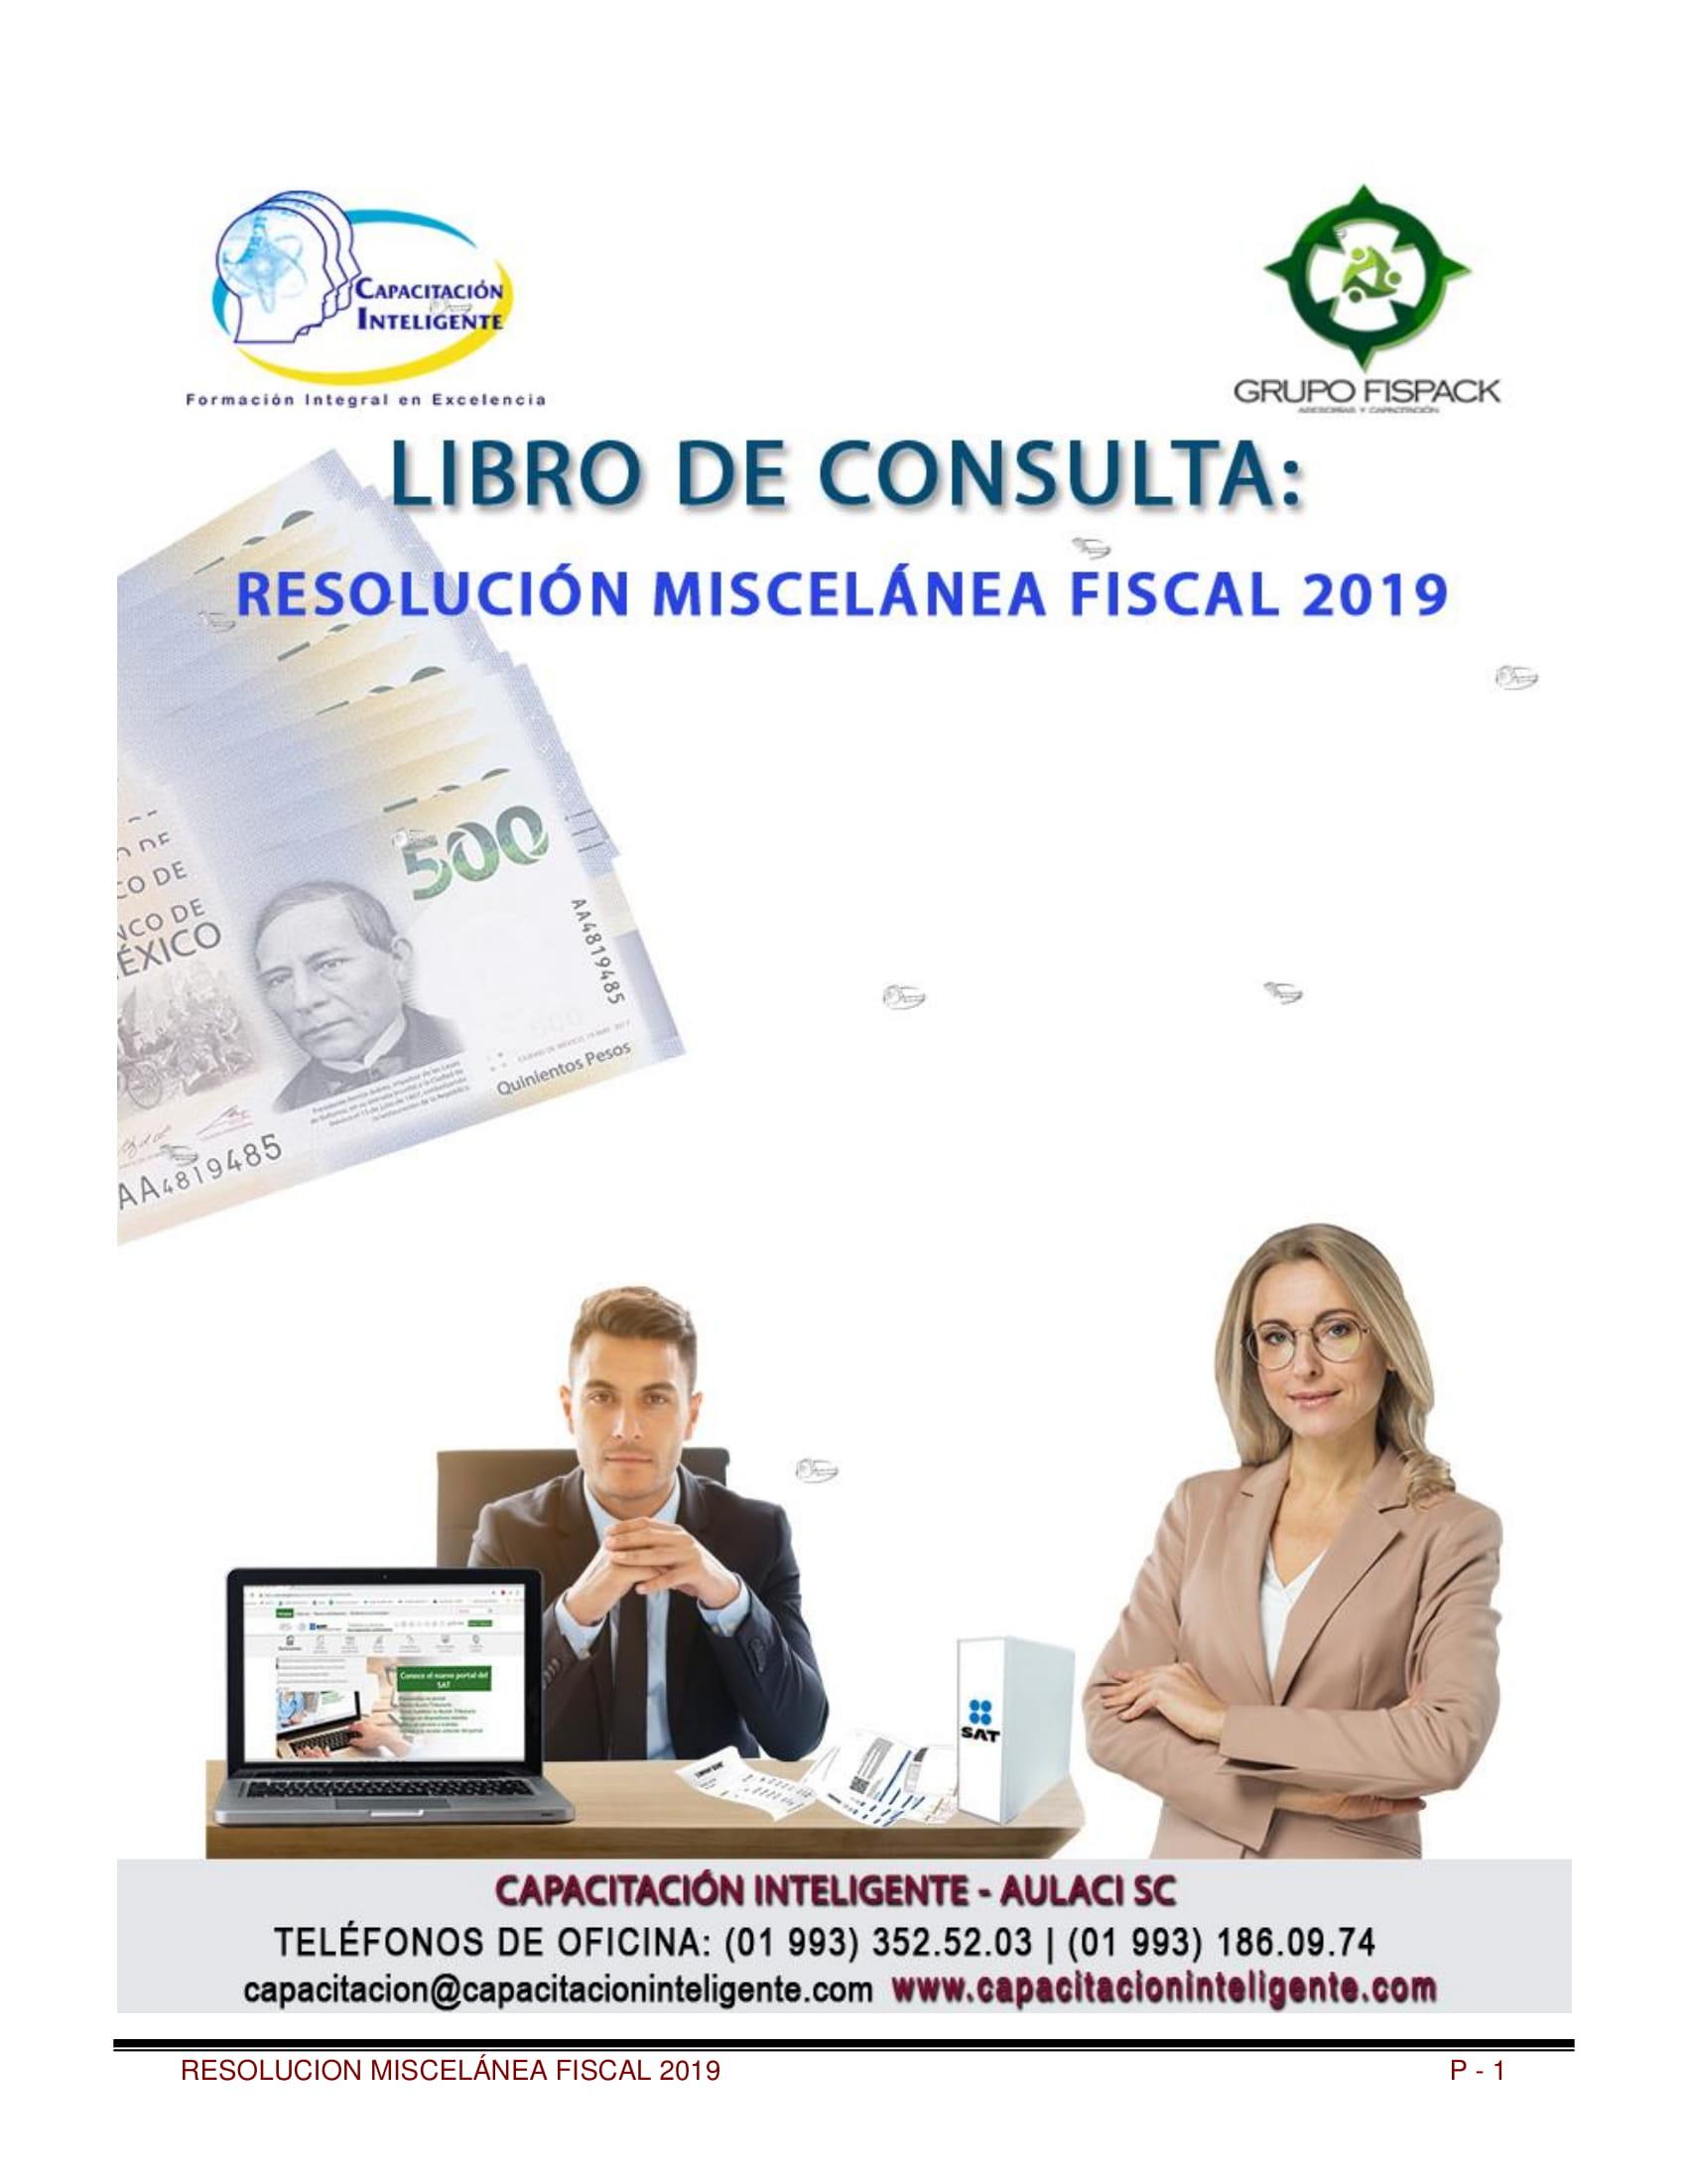 Libro_Consulta_Resolucion_Miscelanea_Fiscal_2019